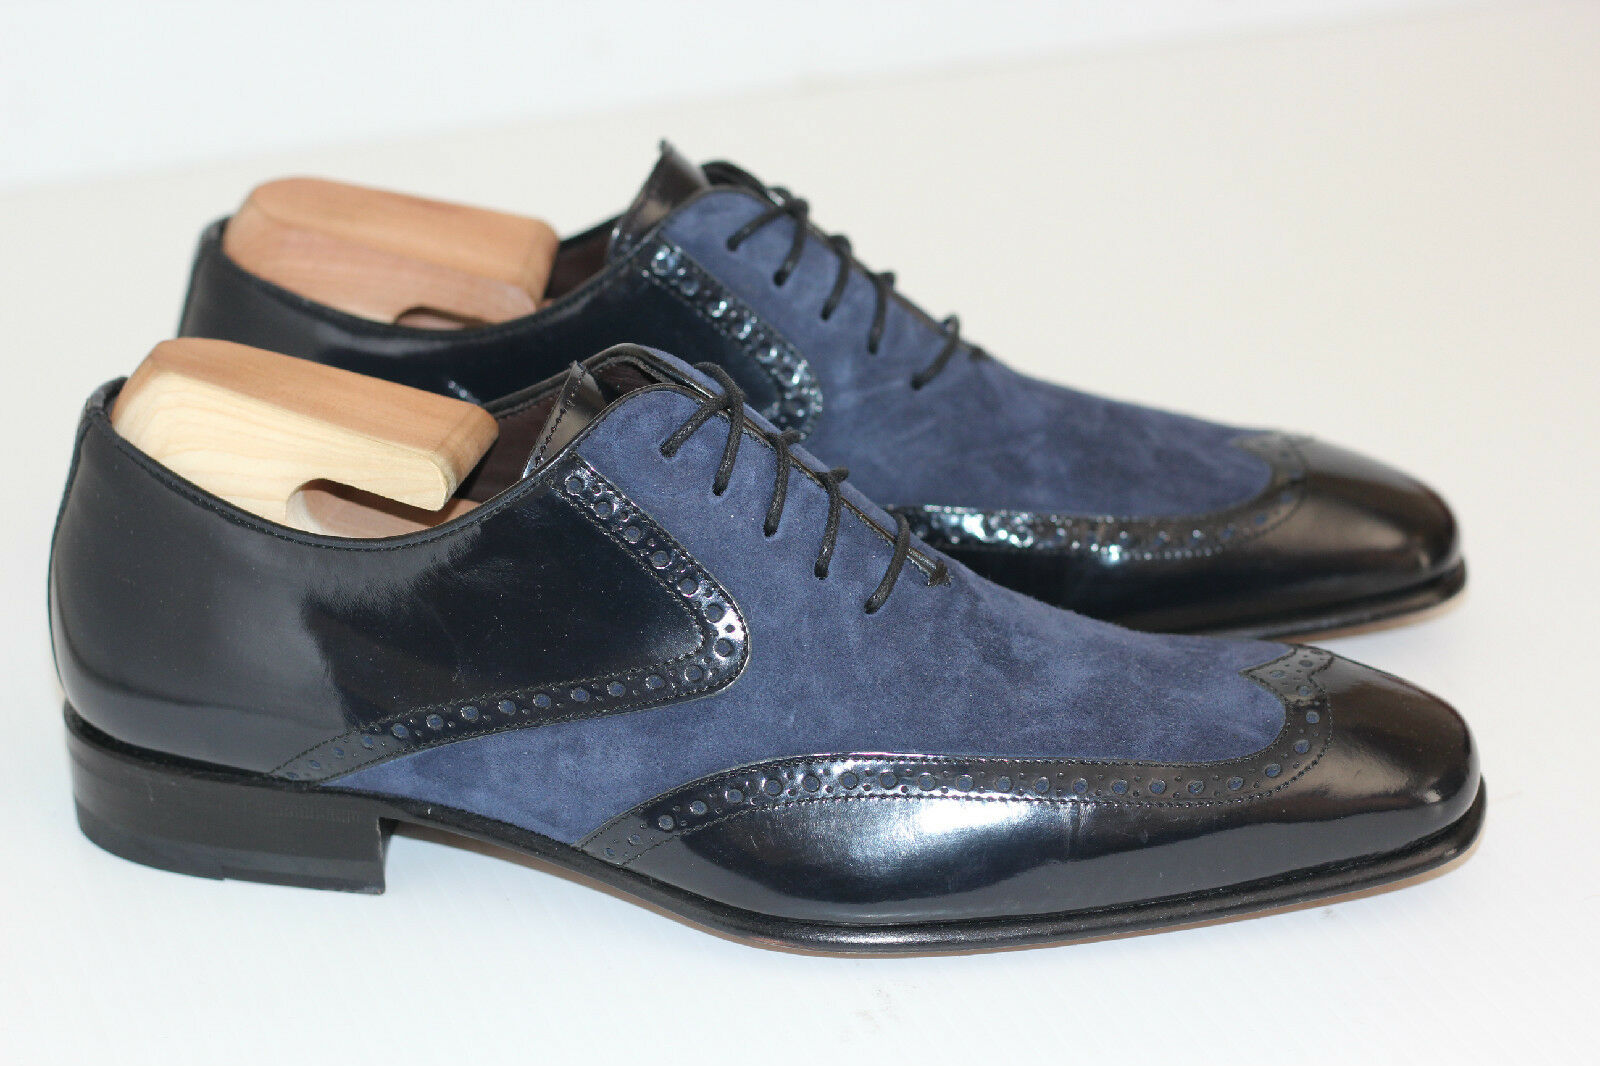 1abceae3f9e88 Mens Mezlan  Zorba  Wingtip Oxford Dress shoes - bluee - Size 7 M ...